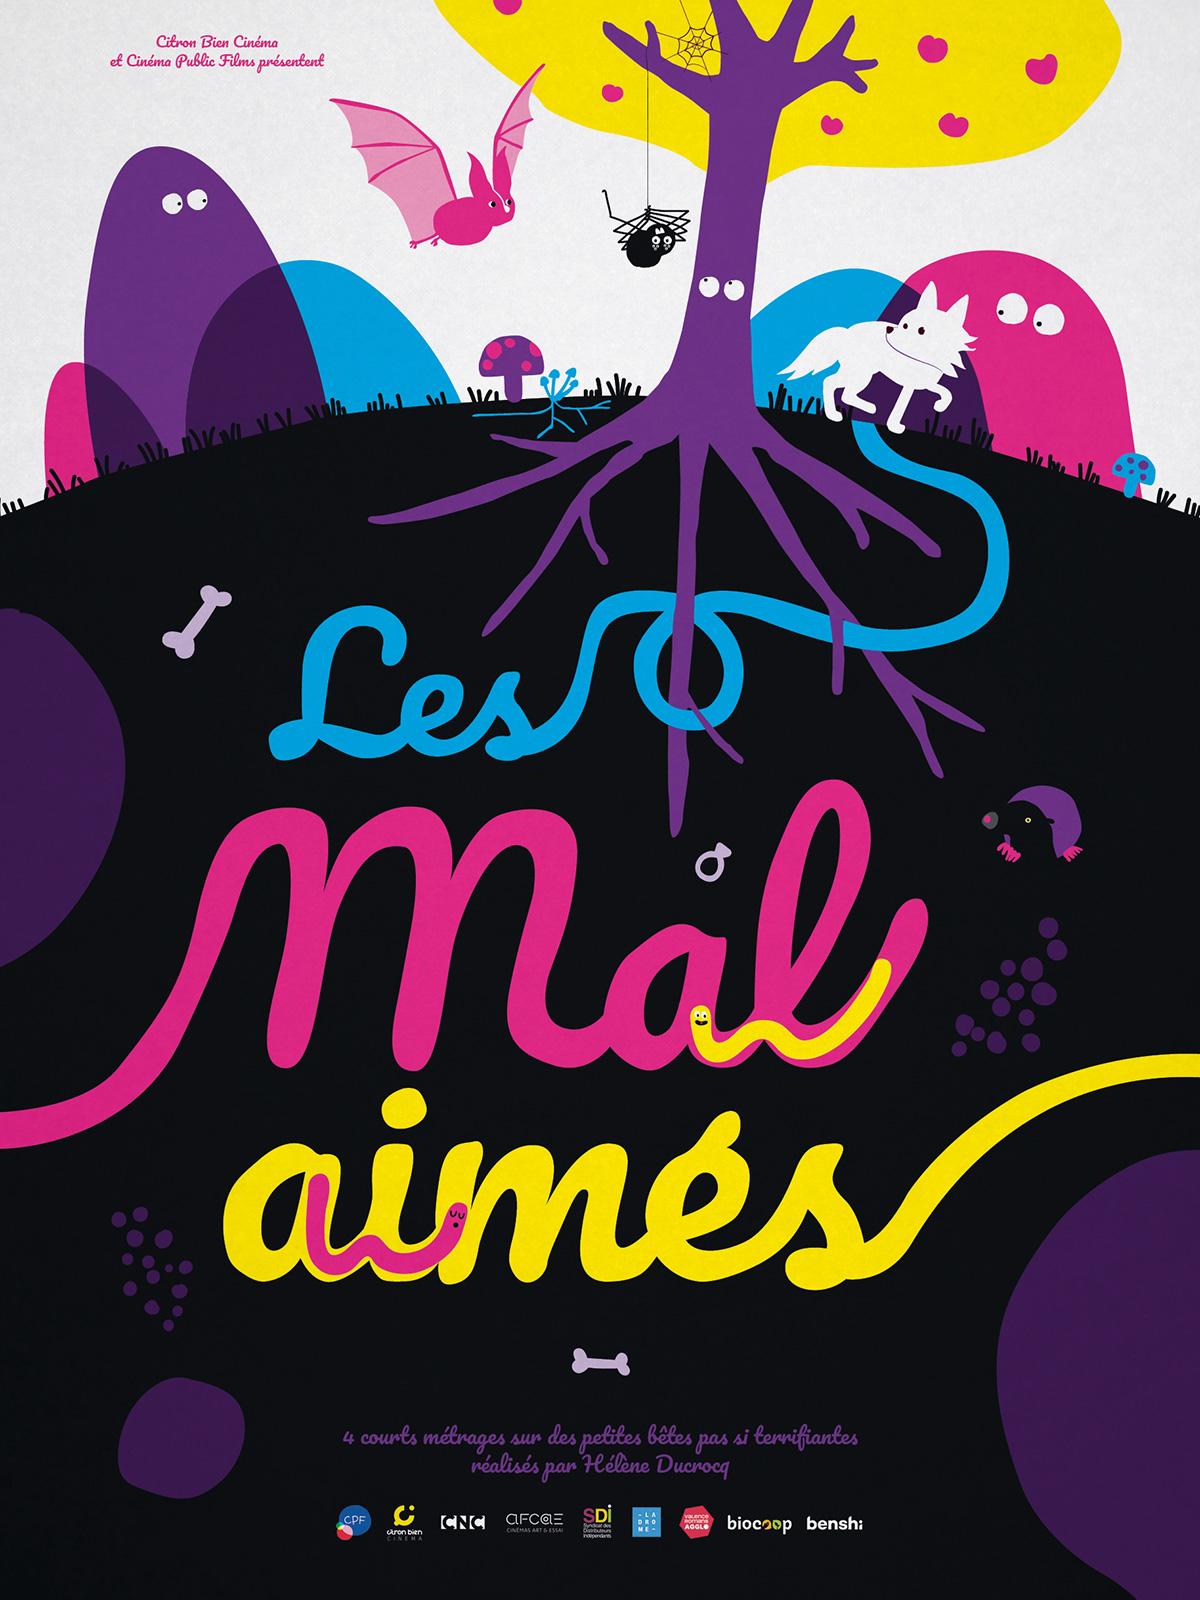 http://rss.allocine.fr/~r/ac/cine/cettesemaine/~3/RoZ8FMPzBu8/fichefilm_gen_cfilm=283952.html